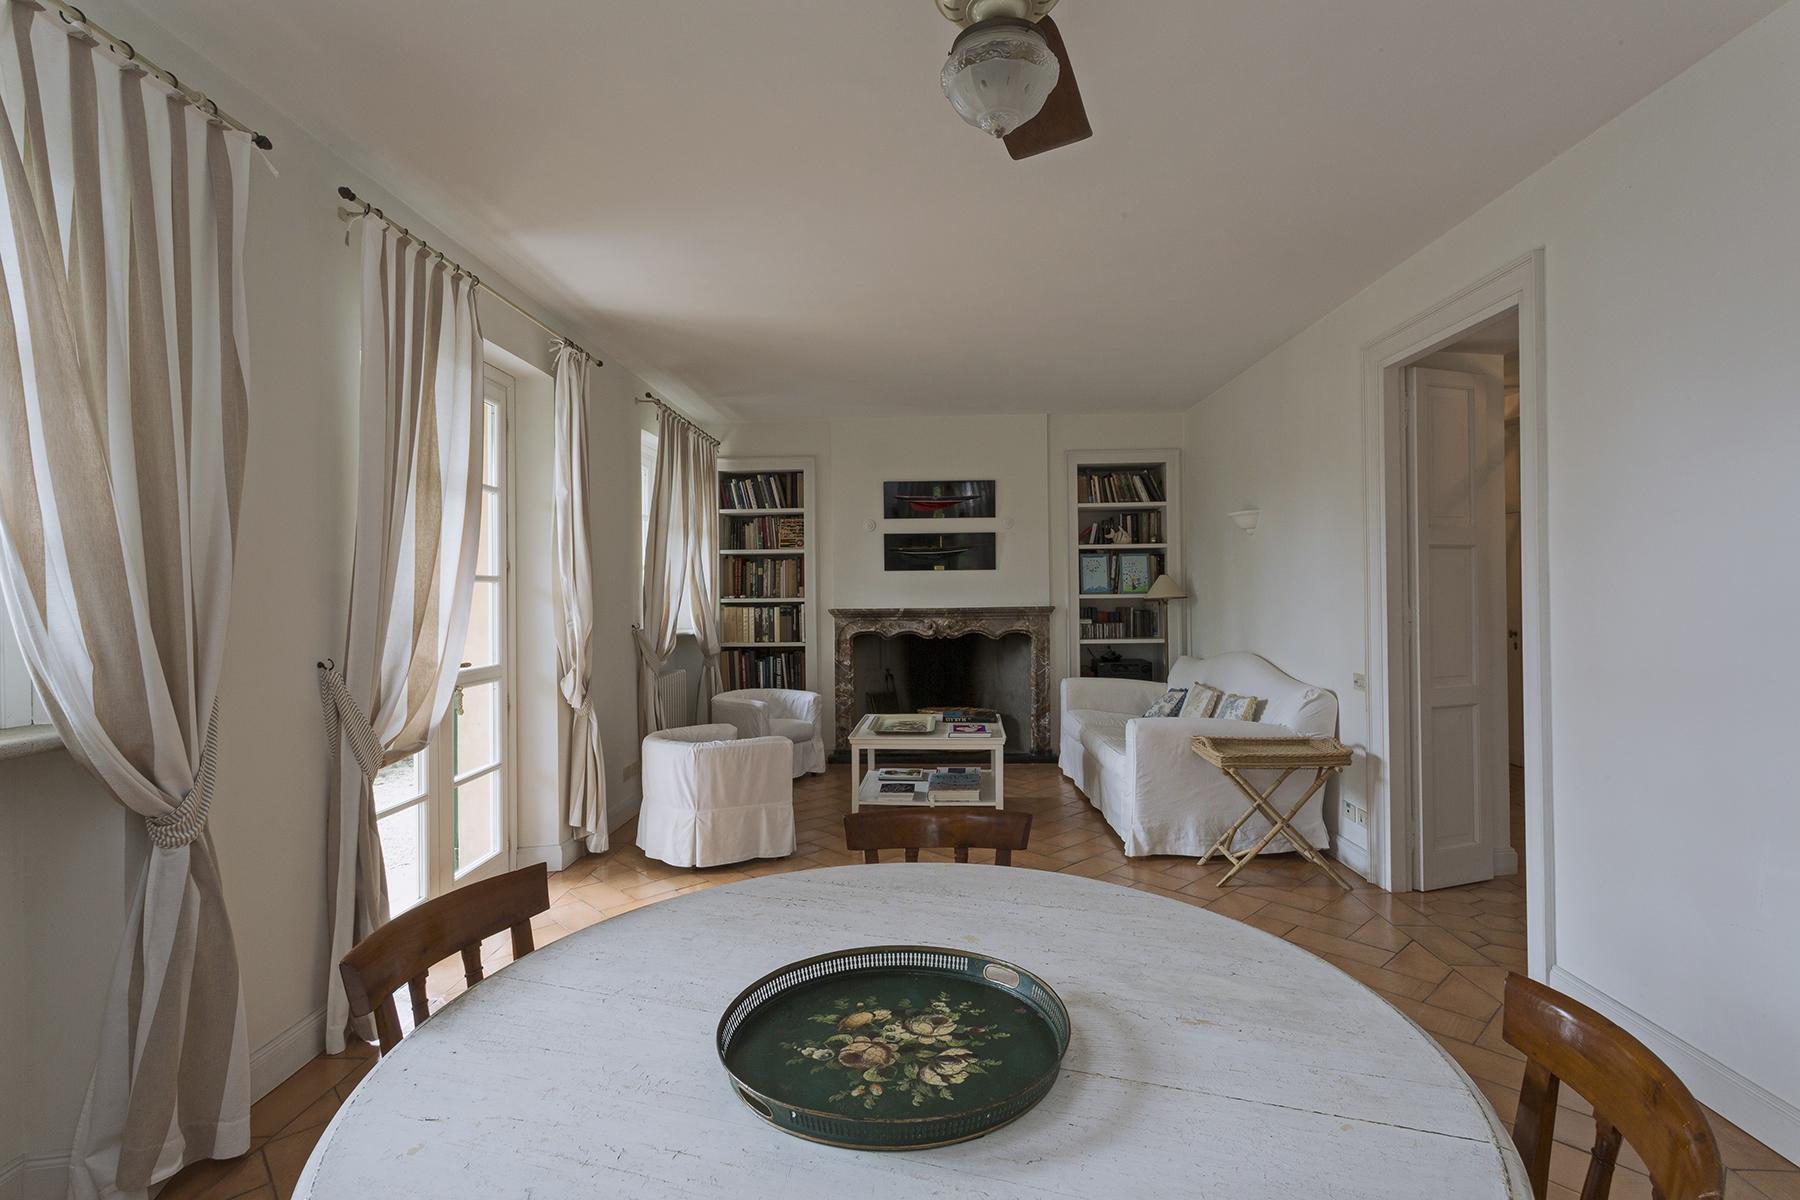 Villa in Vendita a Santa Margherita Ligure: 5 locali, 580 mq - Foto 19